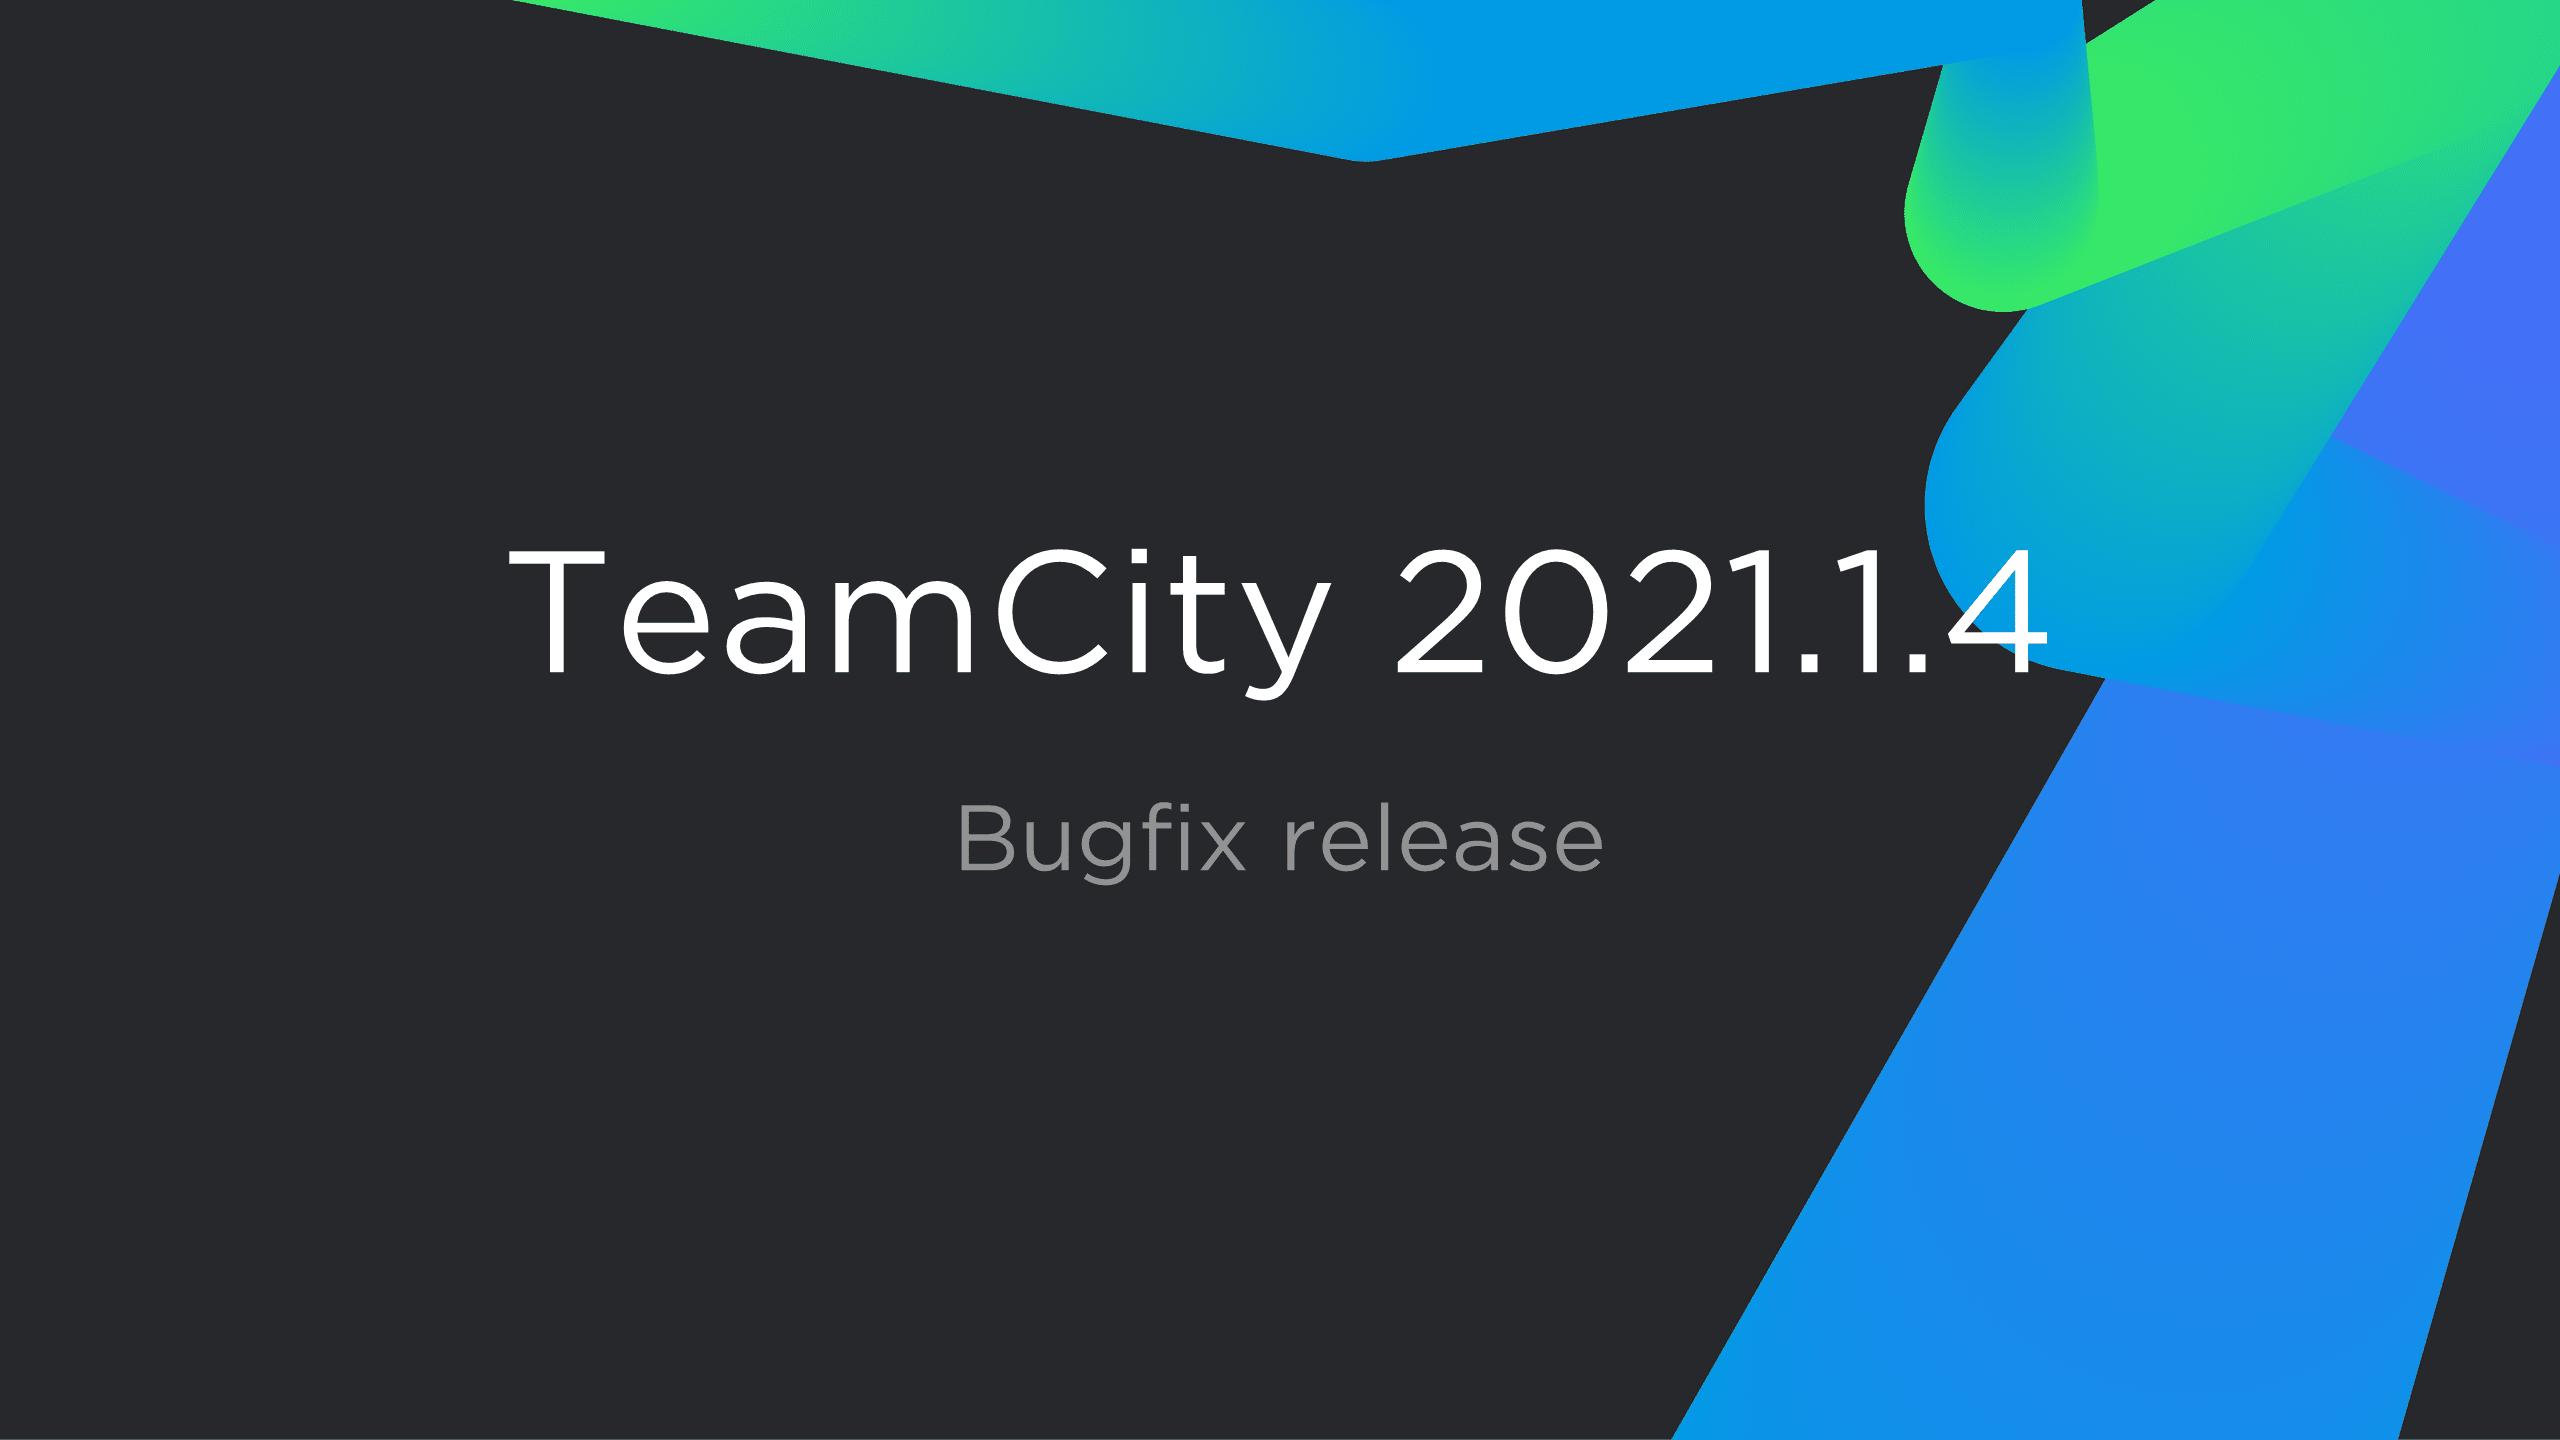 TeamCity 2021.1.4